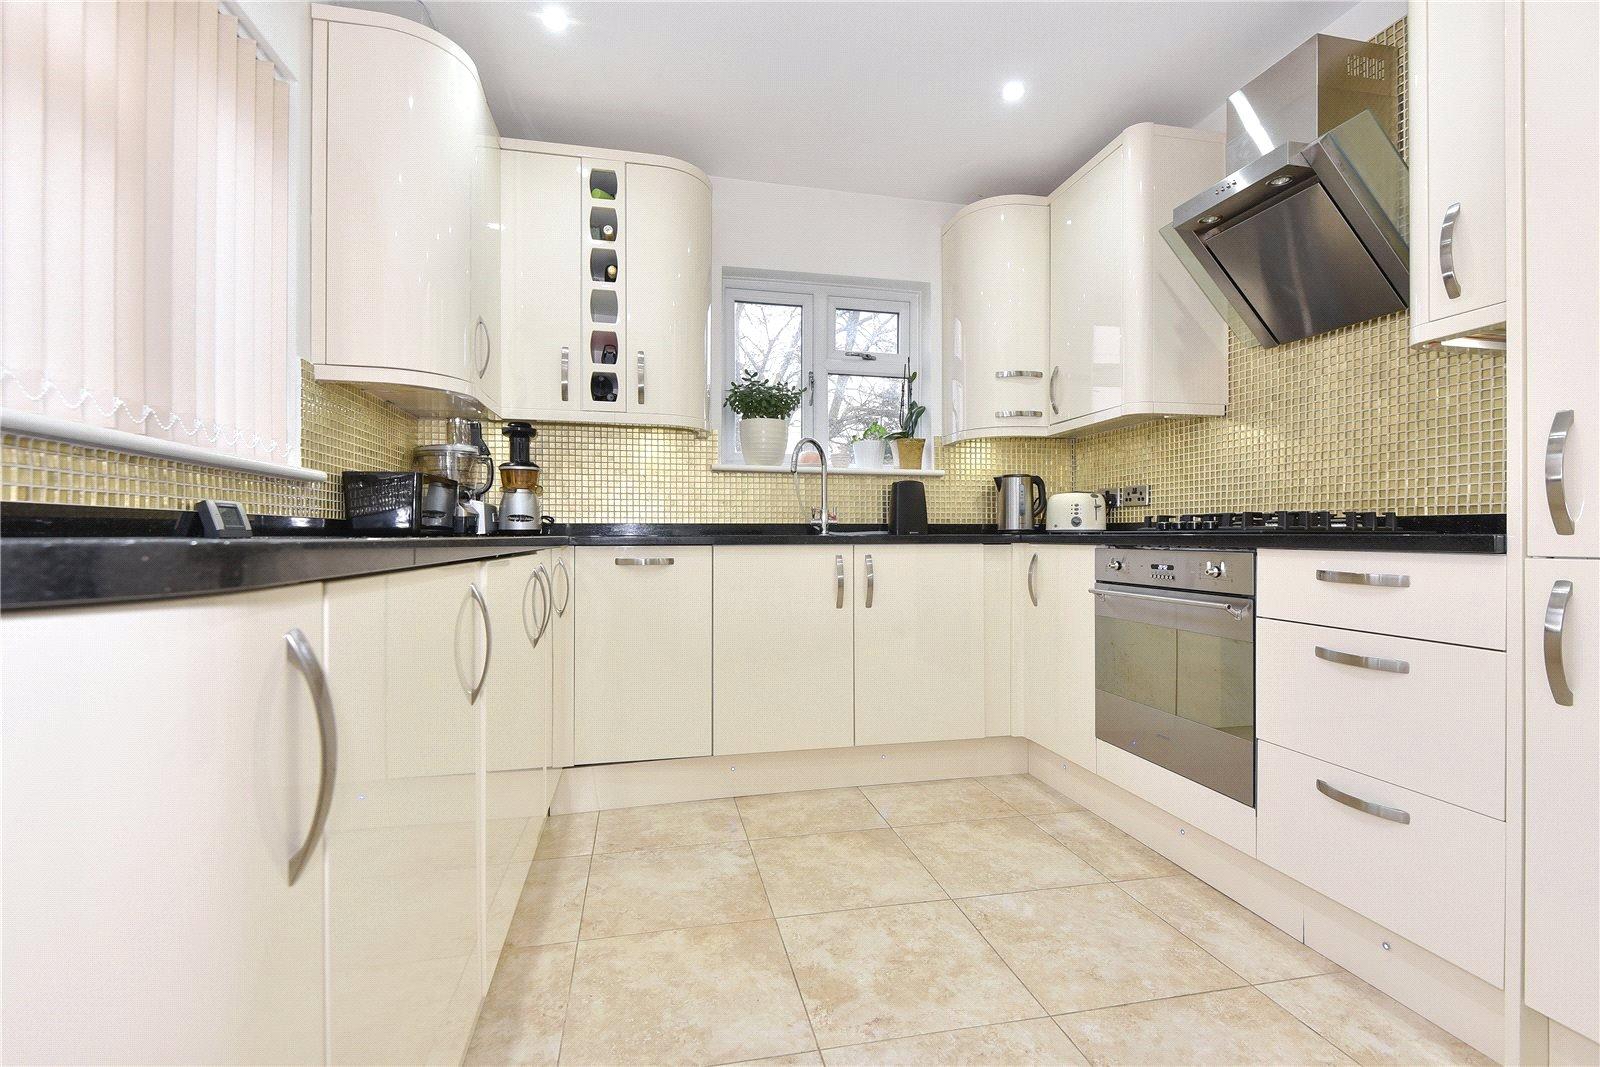 3 Bedrooms Semi Detached House for sale in Desborough Crescent, Maidenhead, Berkshire, SL6